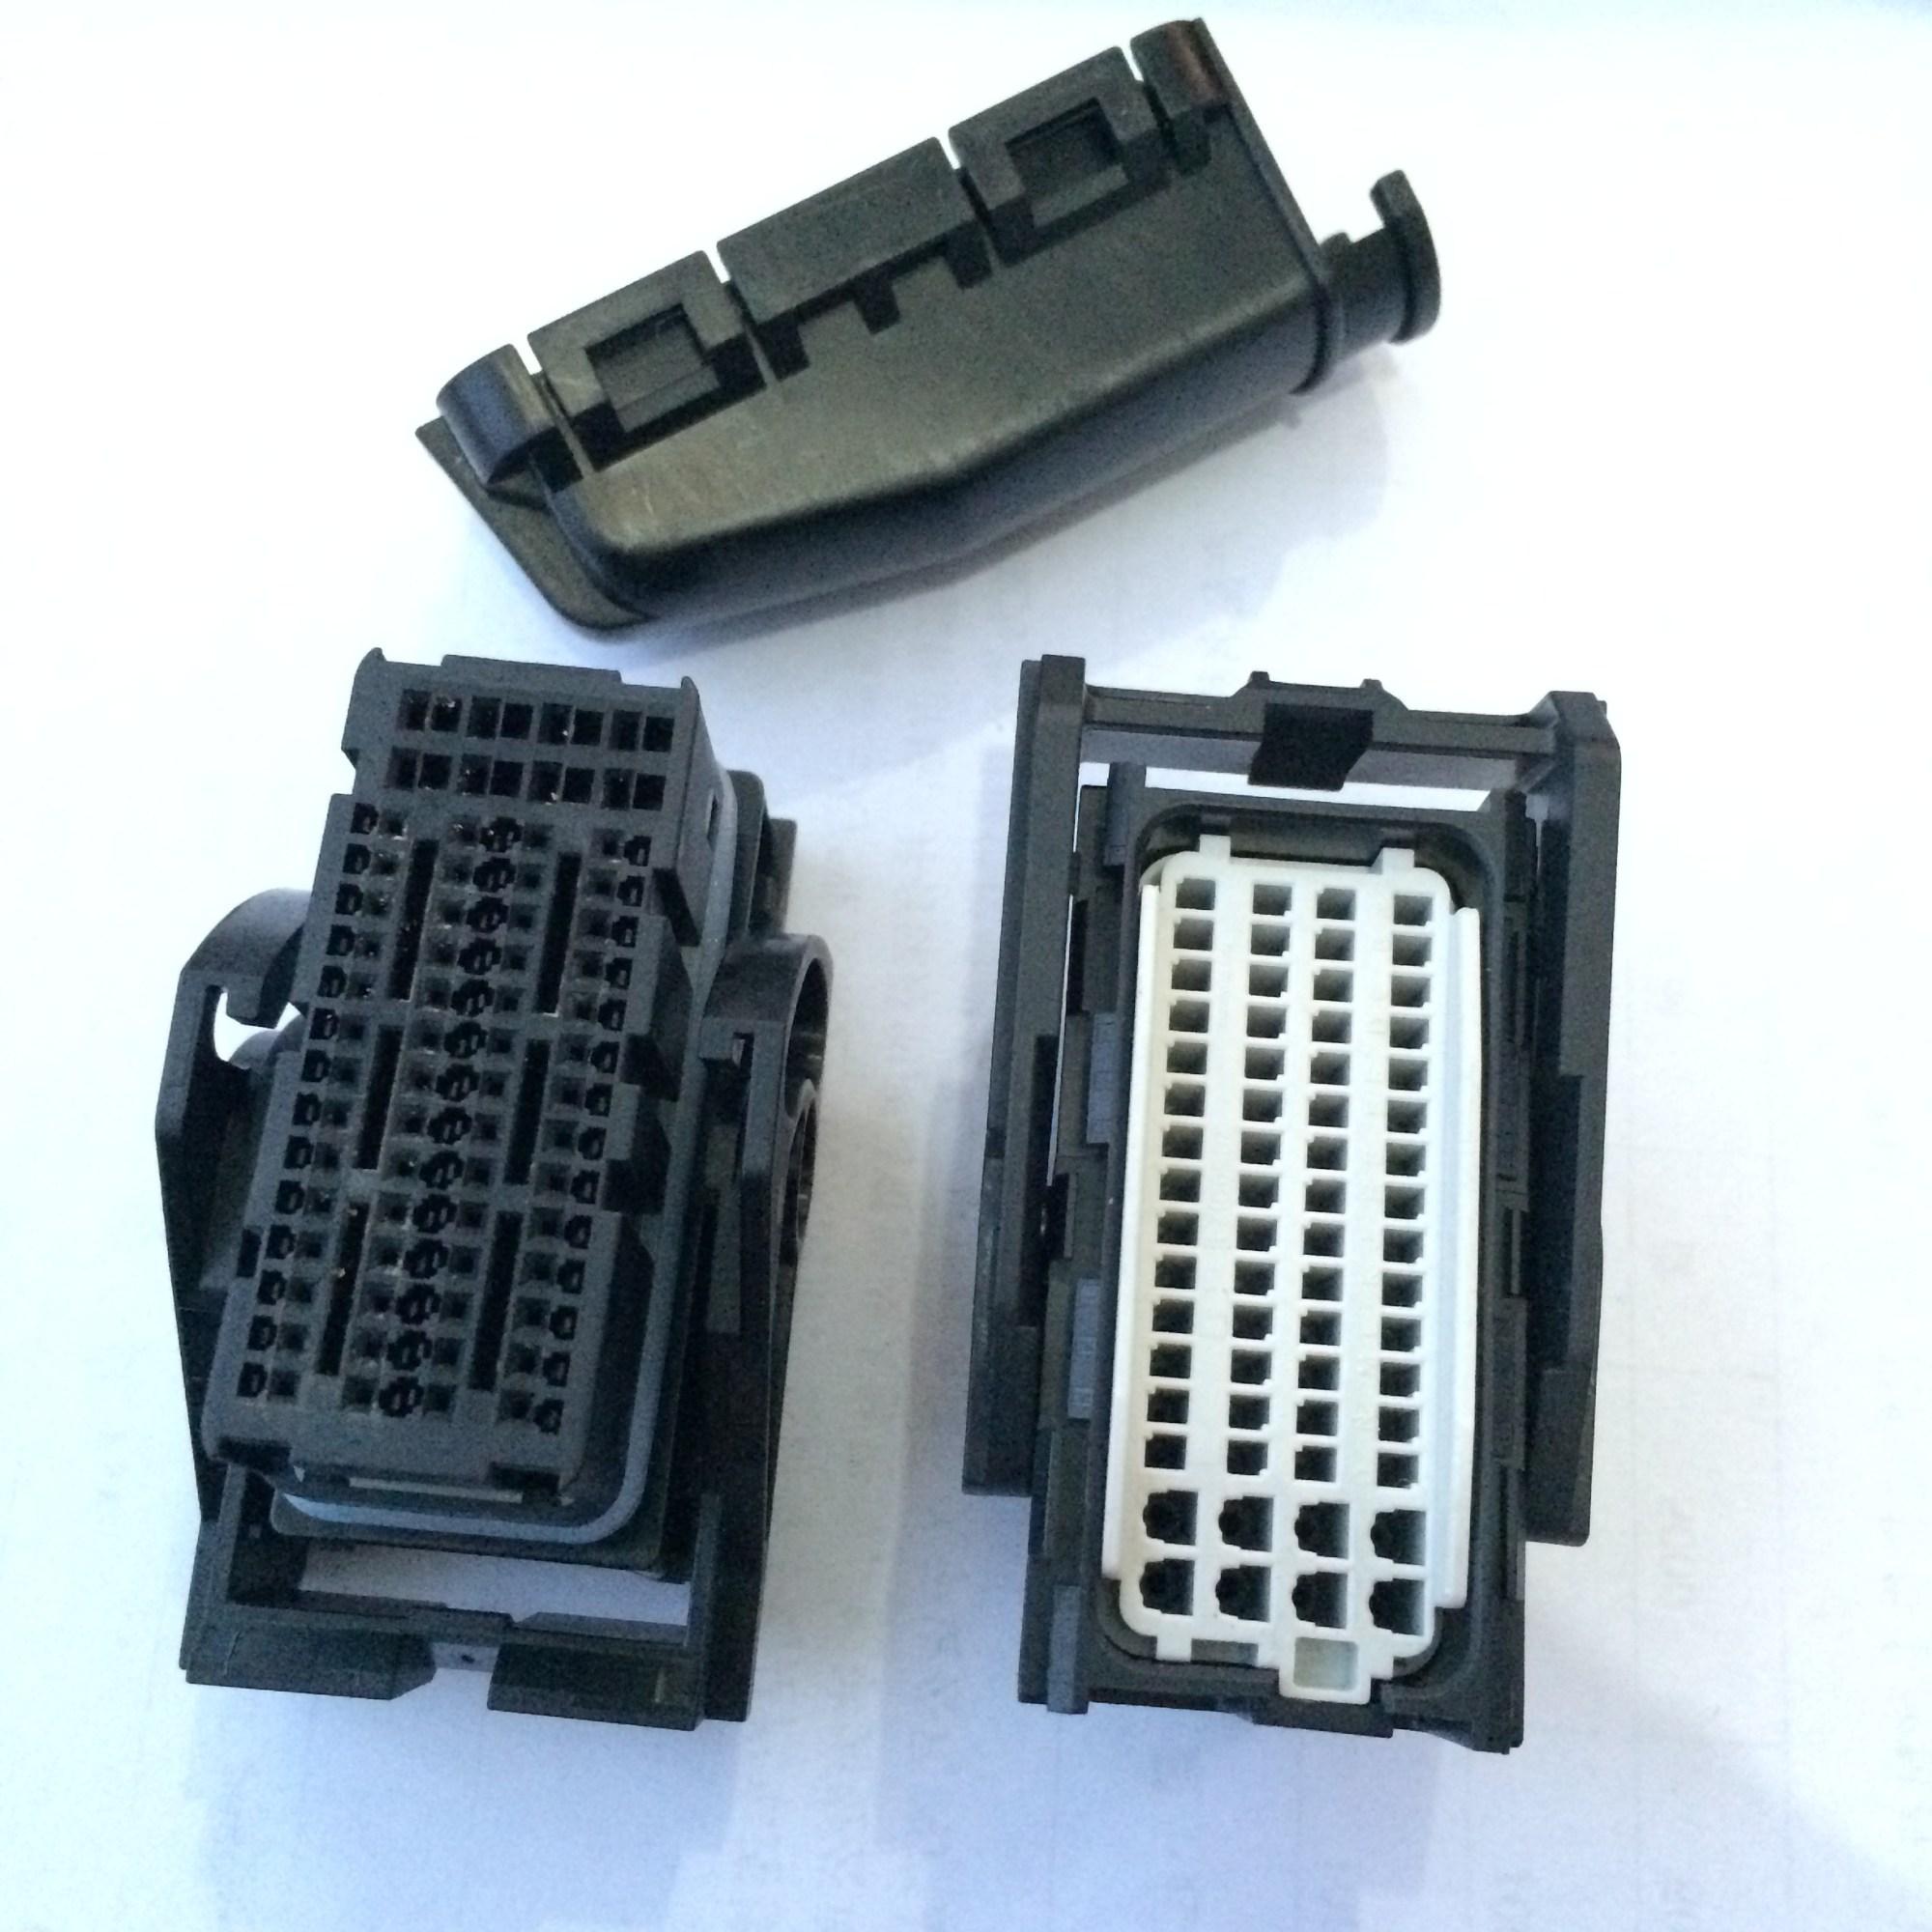 hight resolution of tyco te delphi delphi ecu connector automotive wiring harness connector